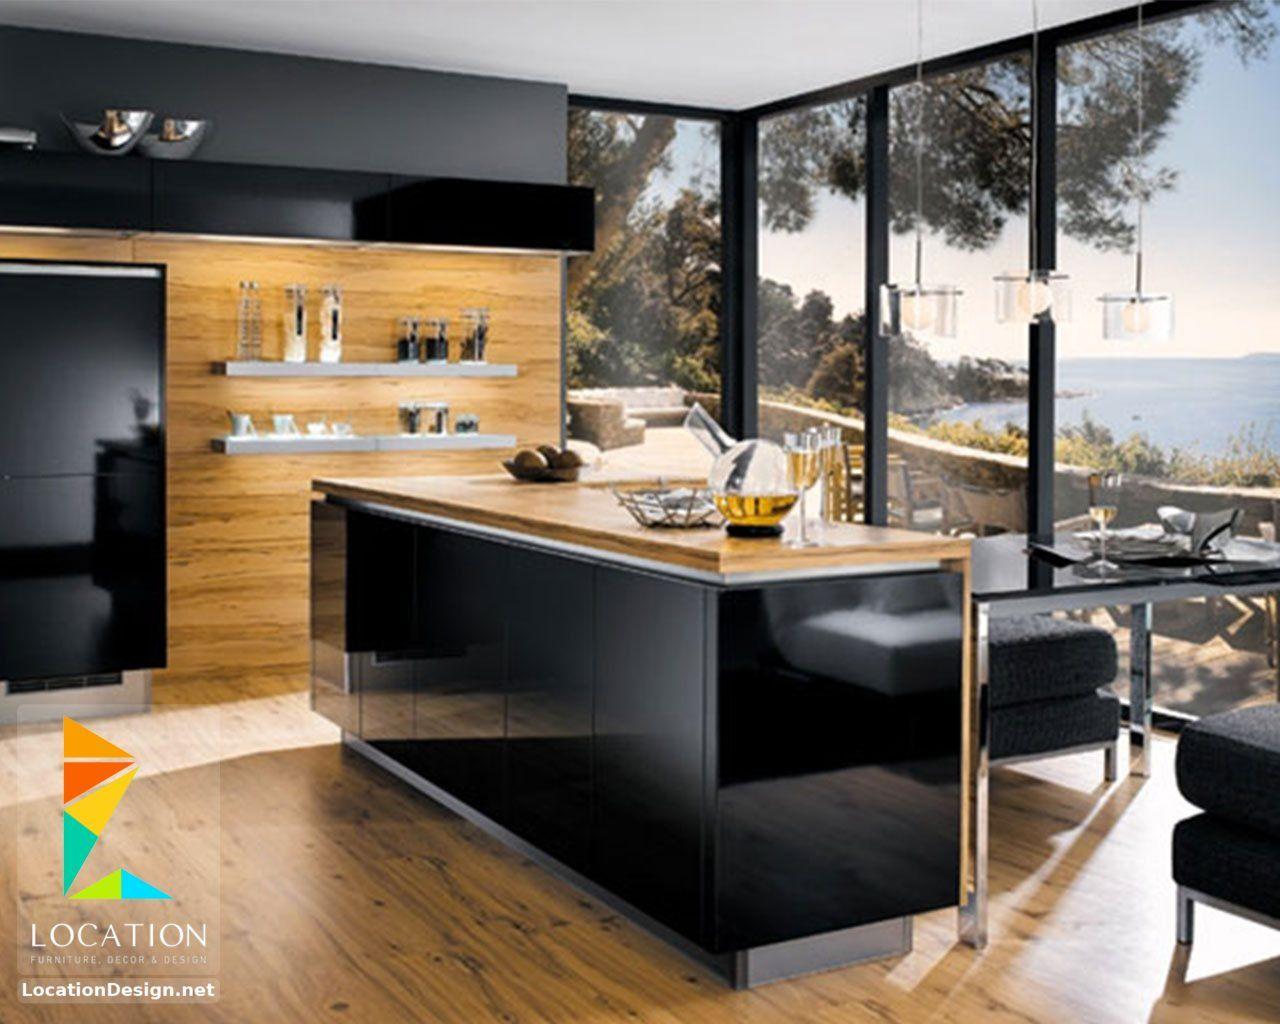 ديكورات مطابخ مودرن صغيرة 2019 2020 Modern Kitchen Island Modern Kitchen Island Design Best Kitchen Designs